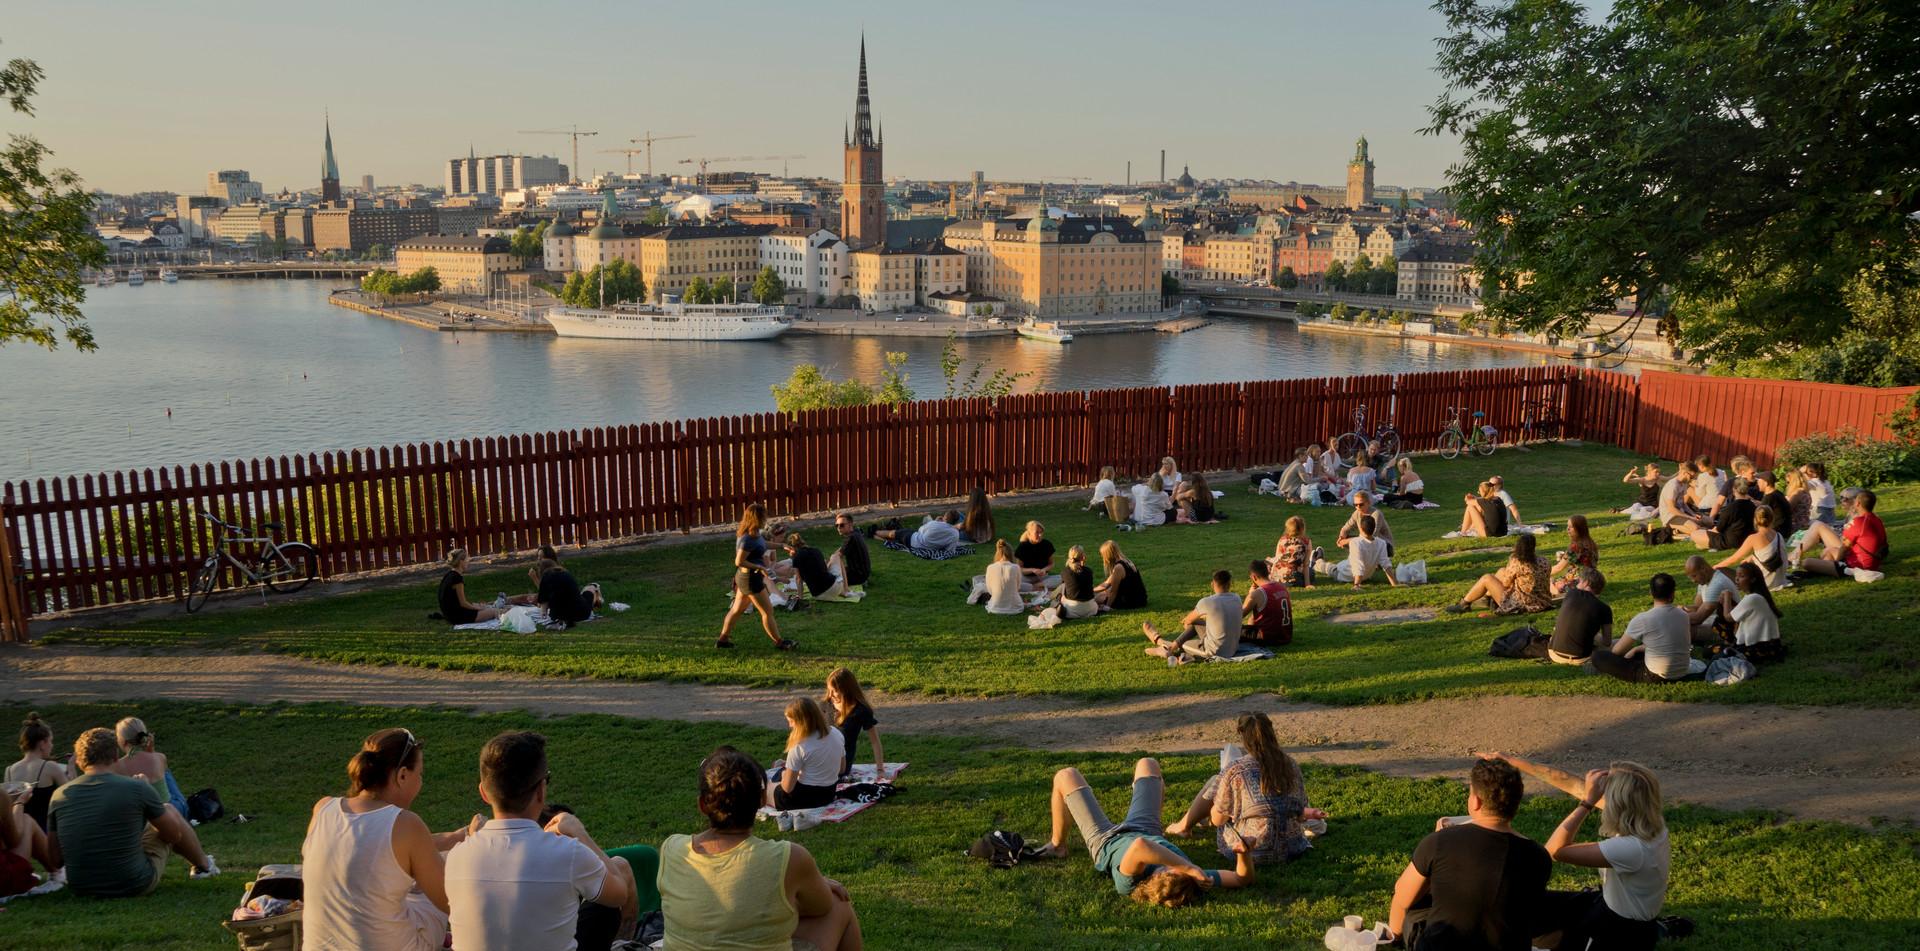 Picnics at sunset in the summer in Stockholm, Sweden